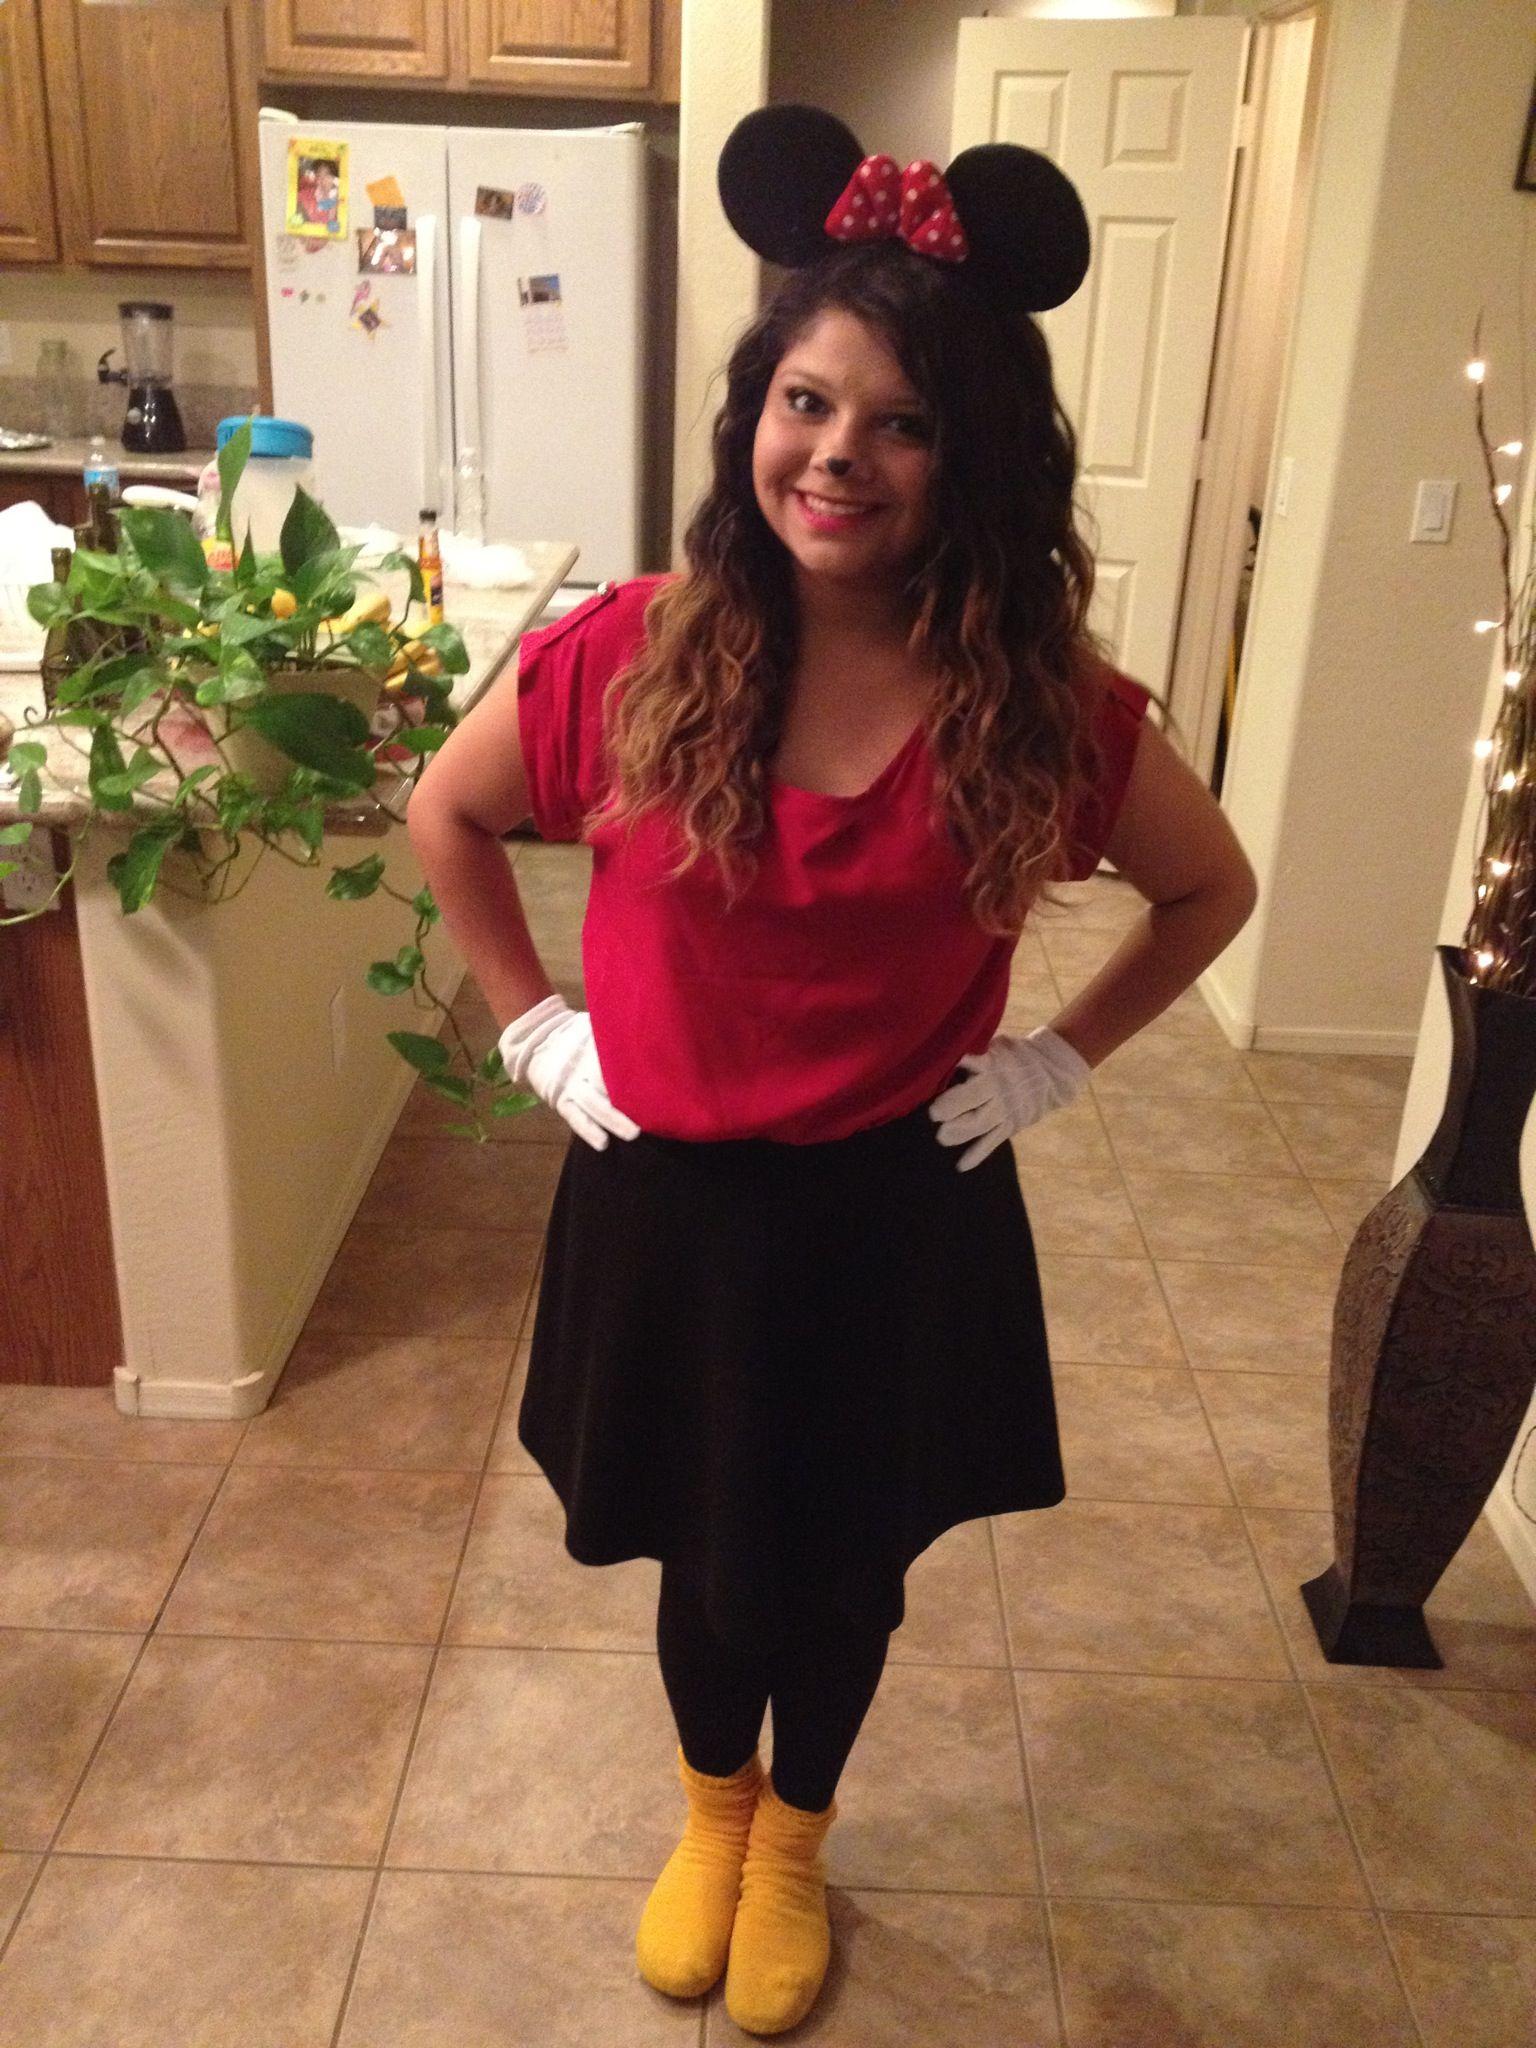 diy minnie mouse costume | disneymania <3 | pinterest | halloween